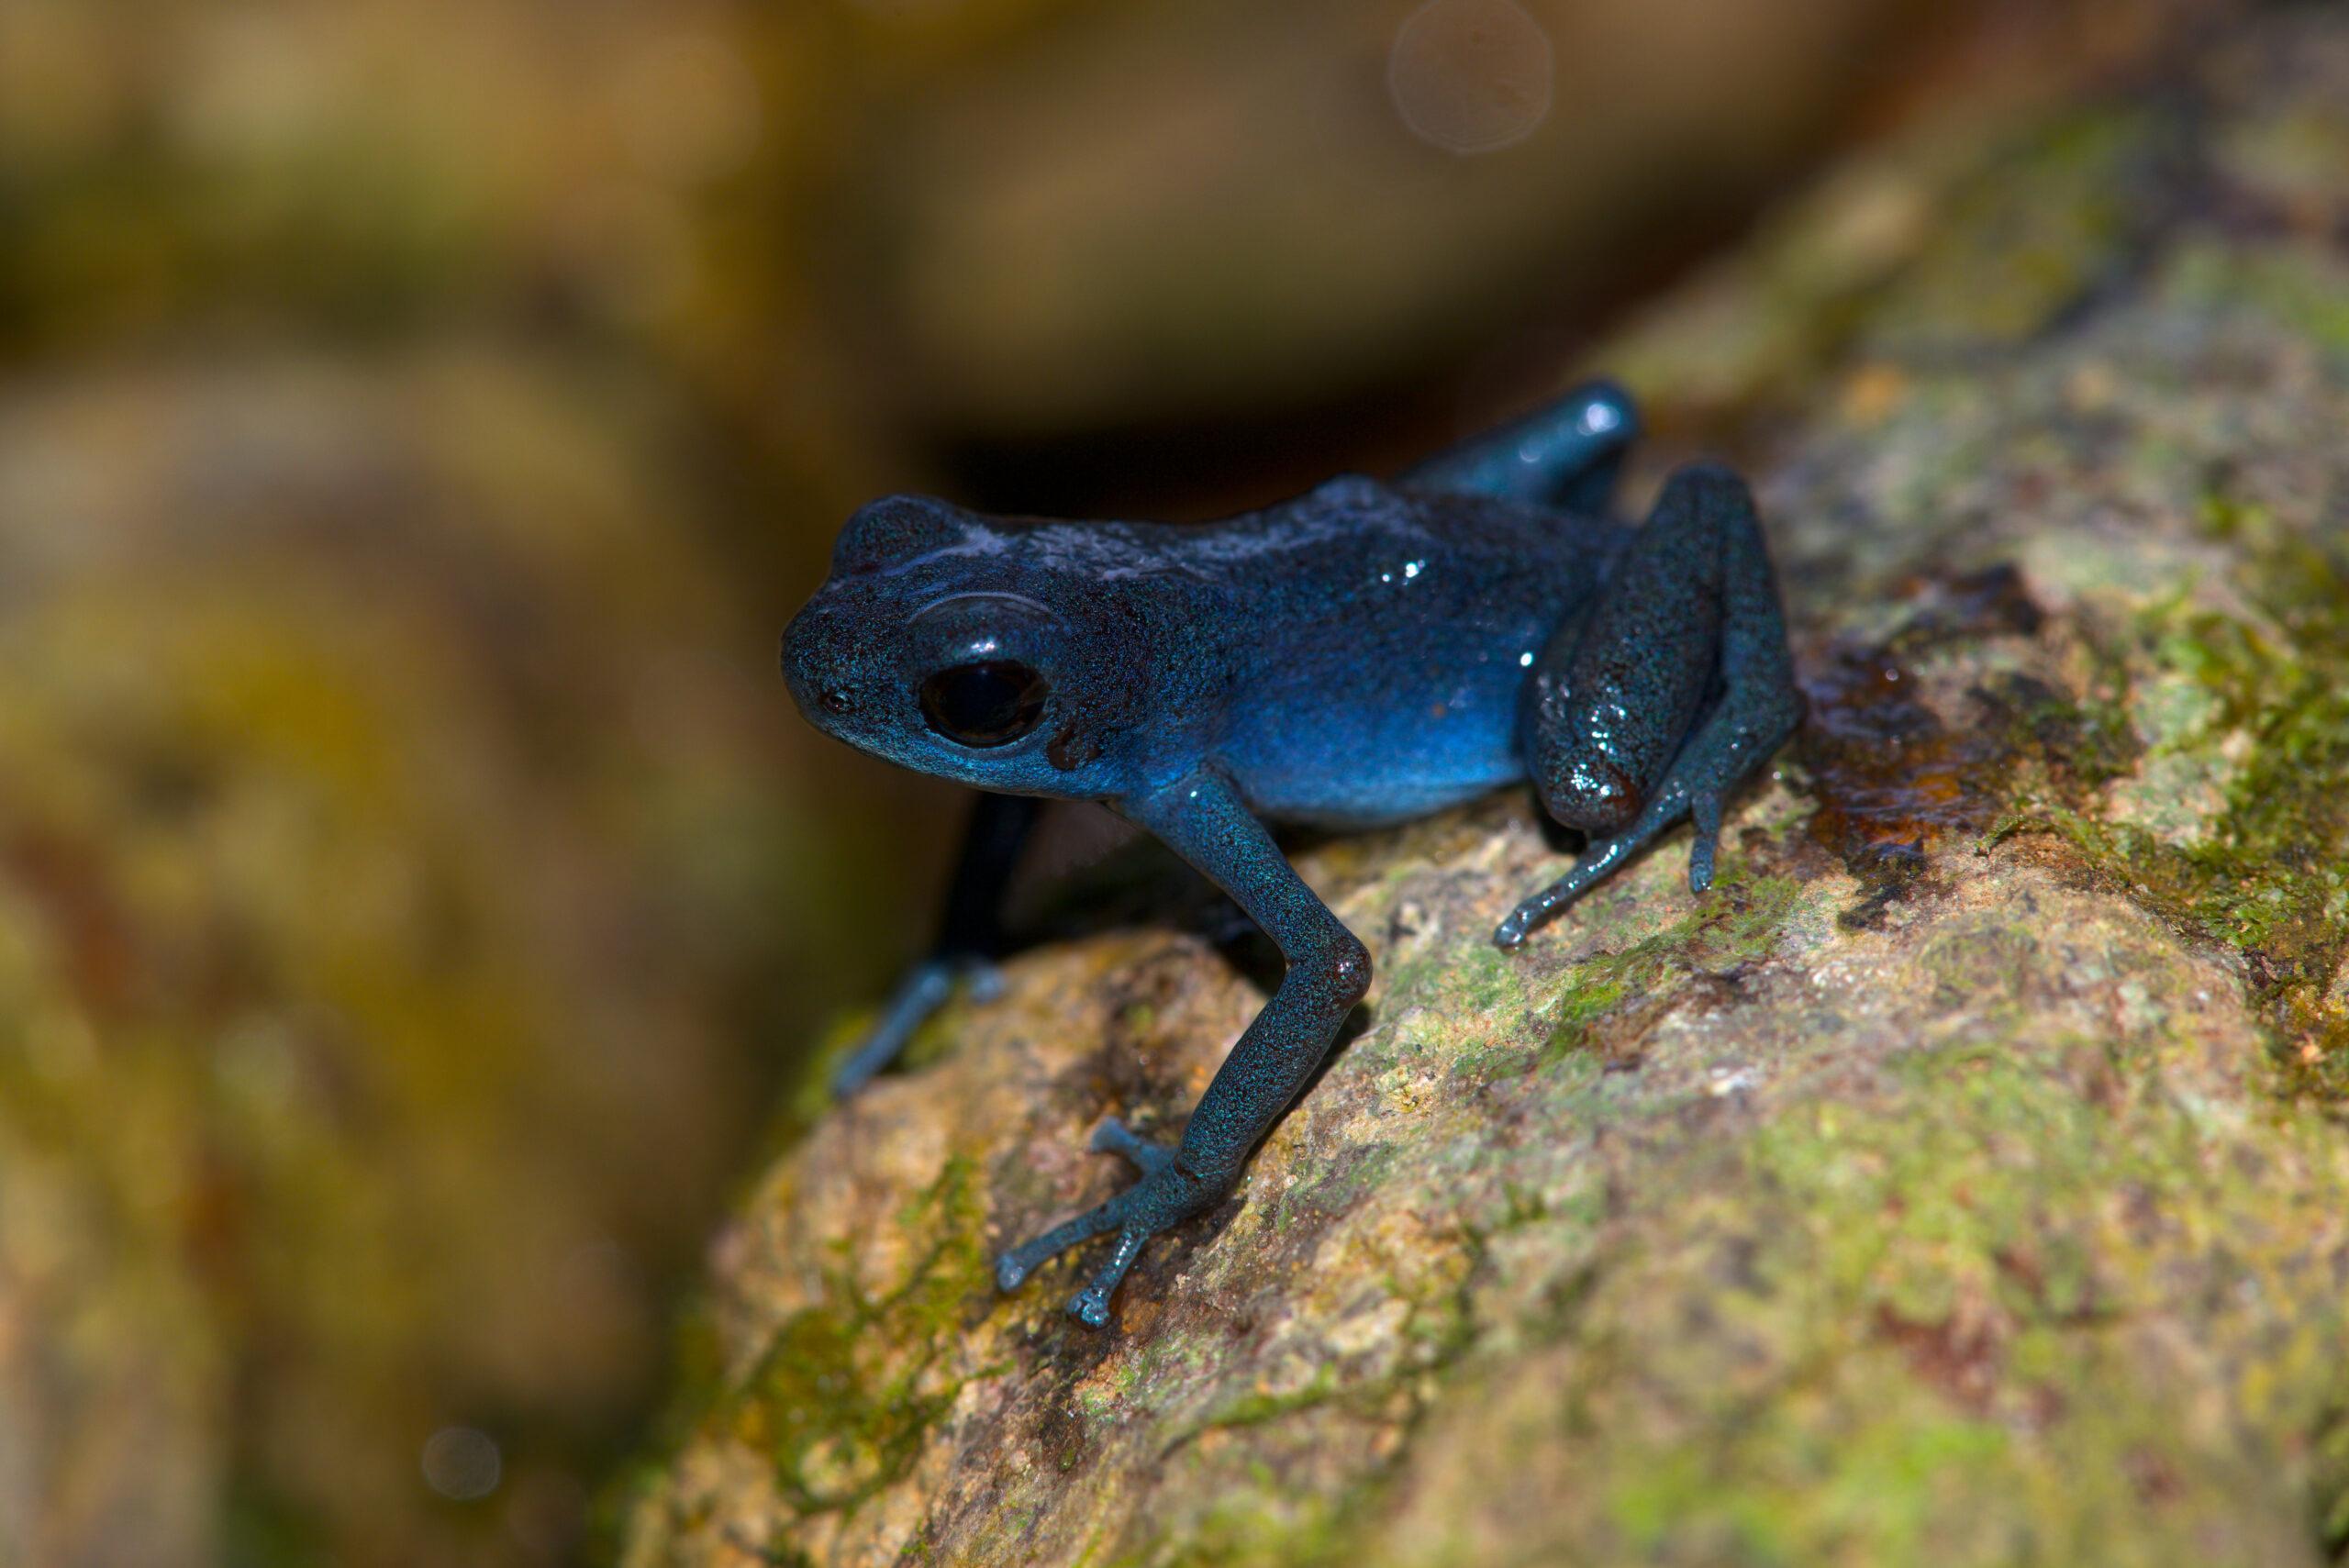 Oophaga pumilio from Tierra Oscura, Bocas del Toro, Panama - by E. Van Heygen.